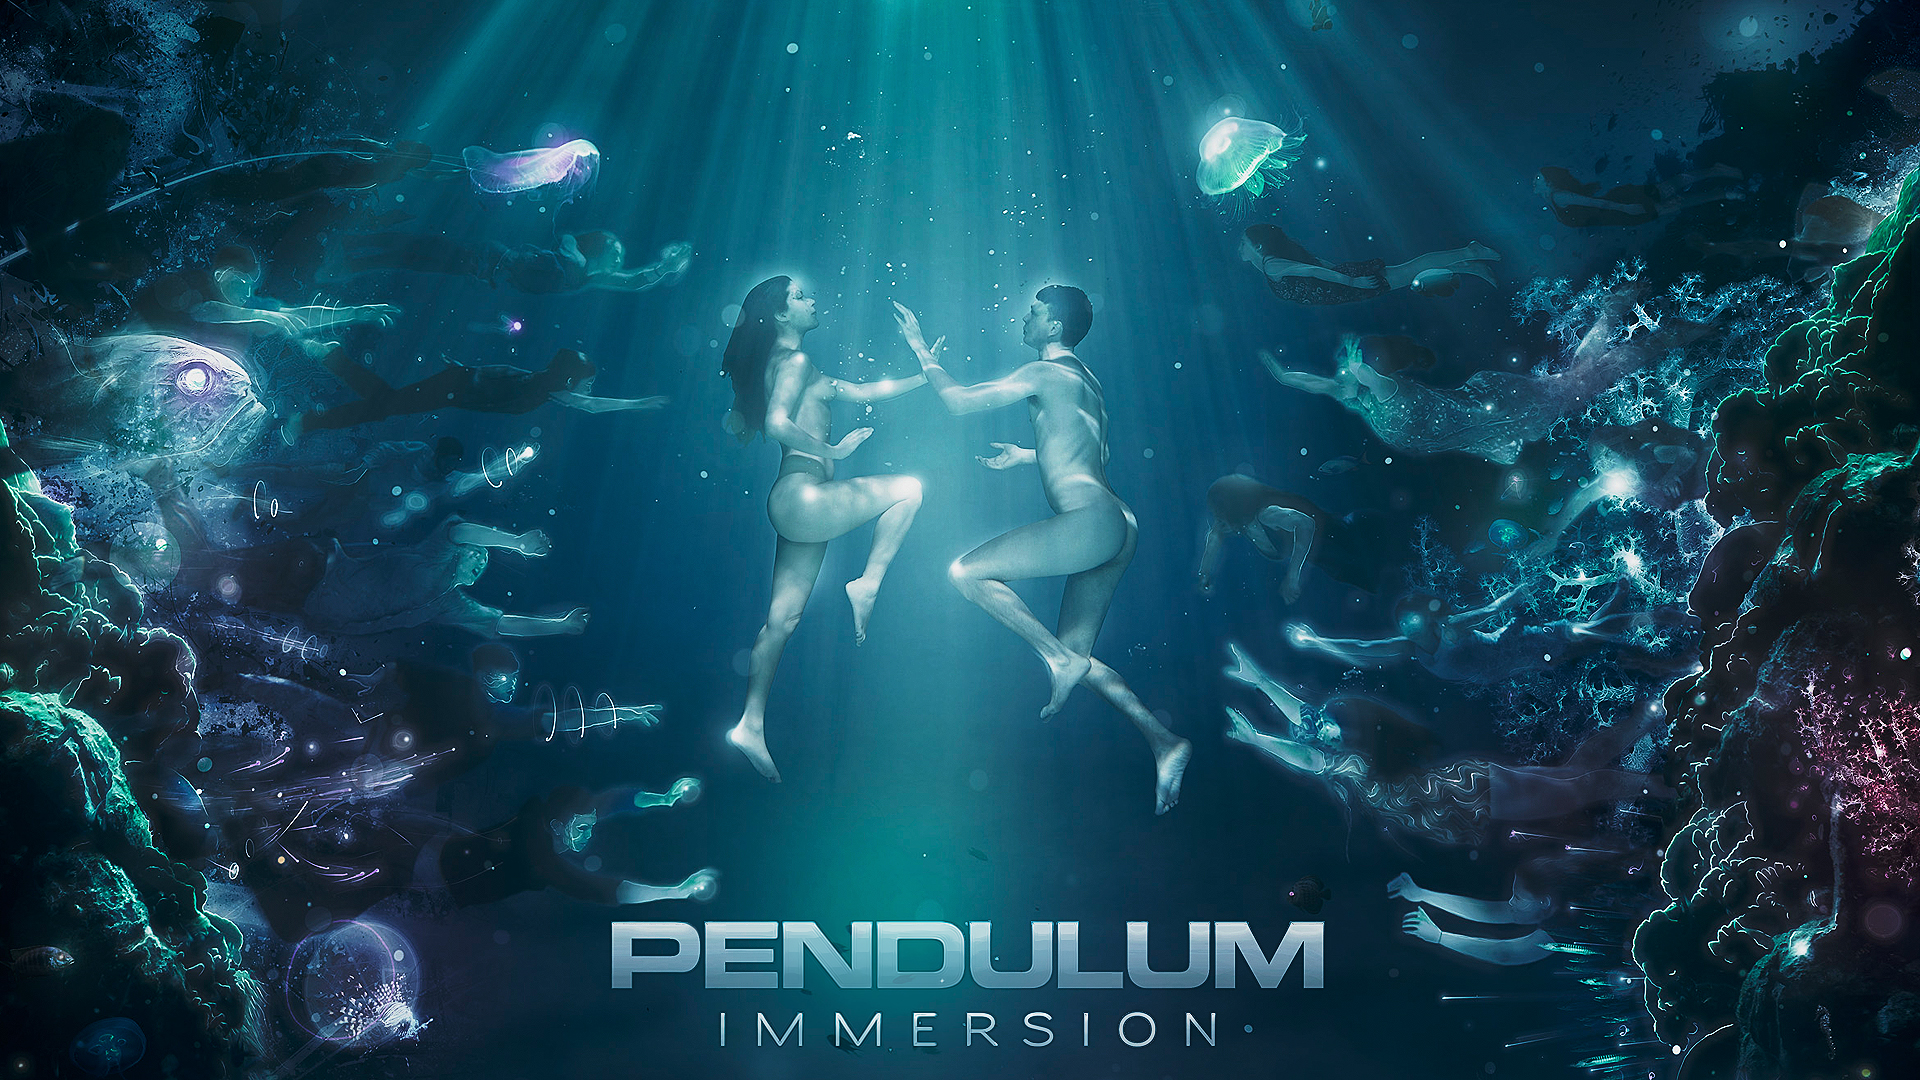 Pendulum-Immersion-wallpaper